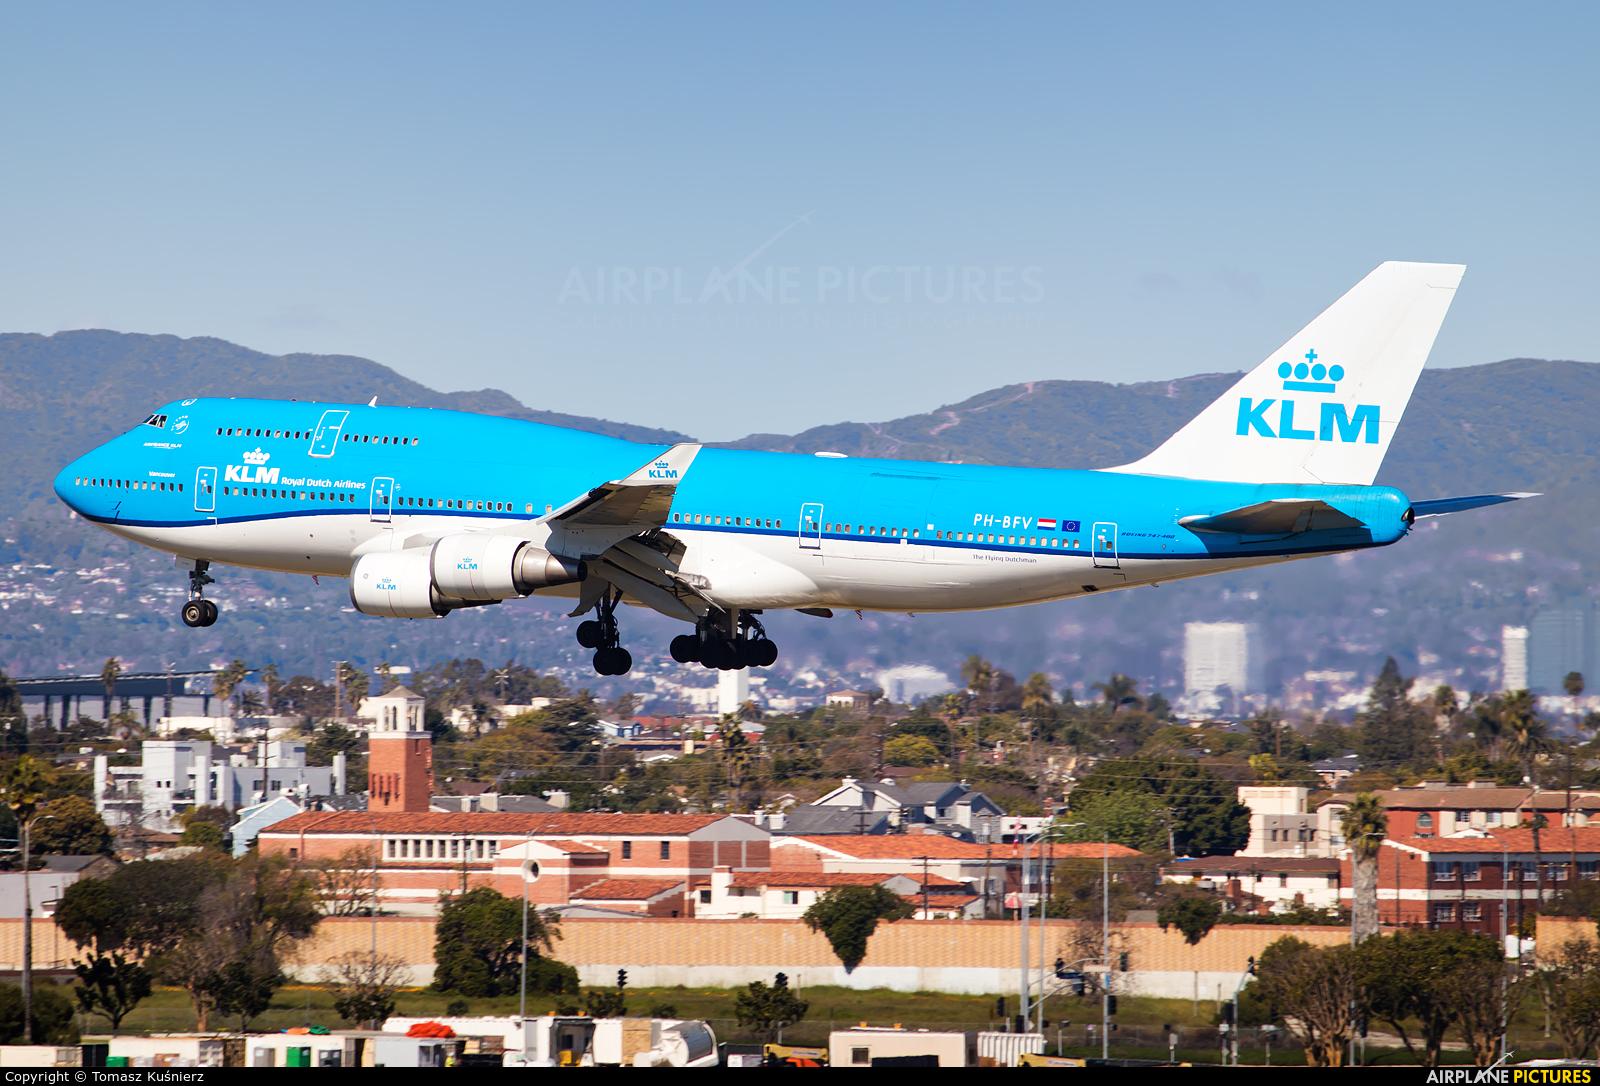 KLM PH-BFV aircraft at Los Angeles Intl